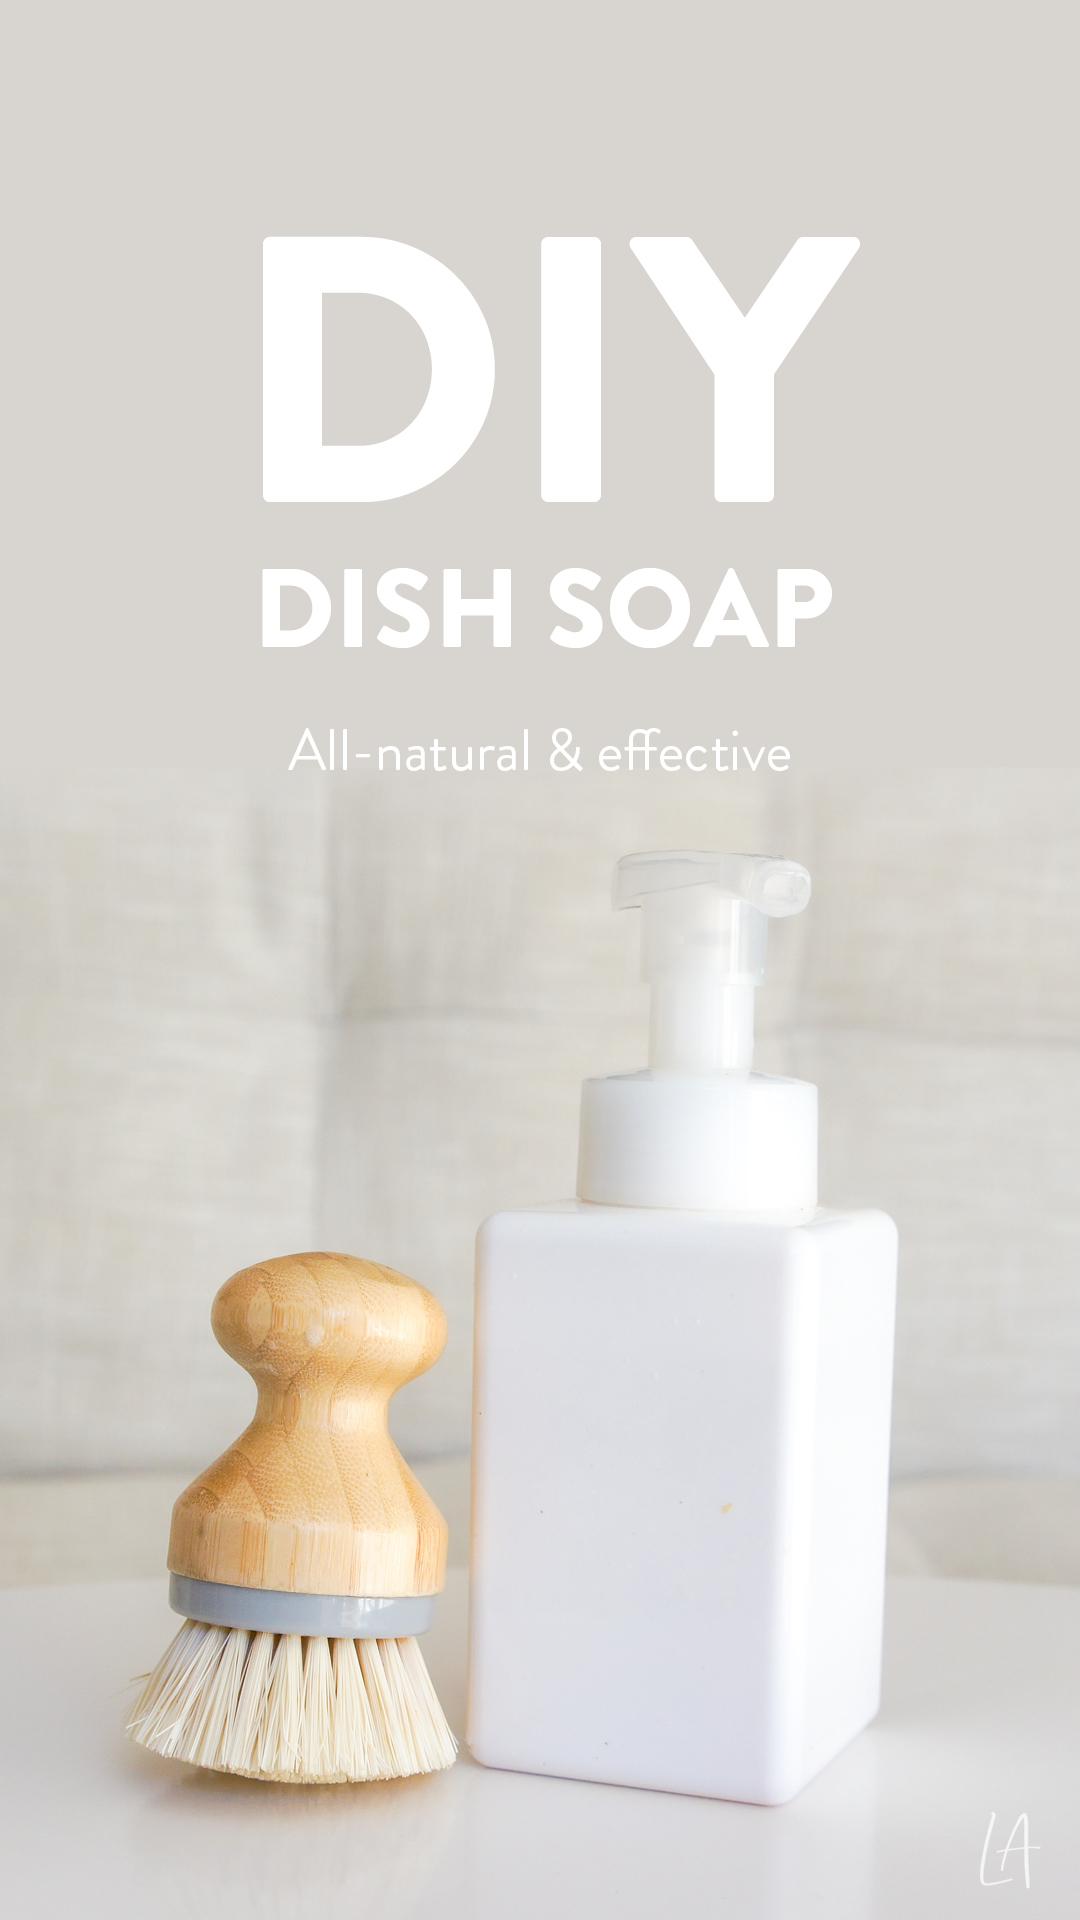 DIY Dish soap, All-natural & effective